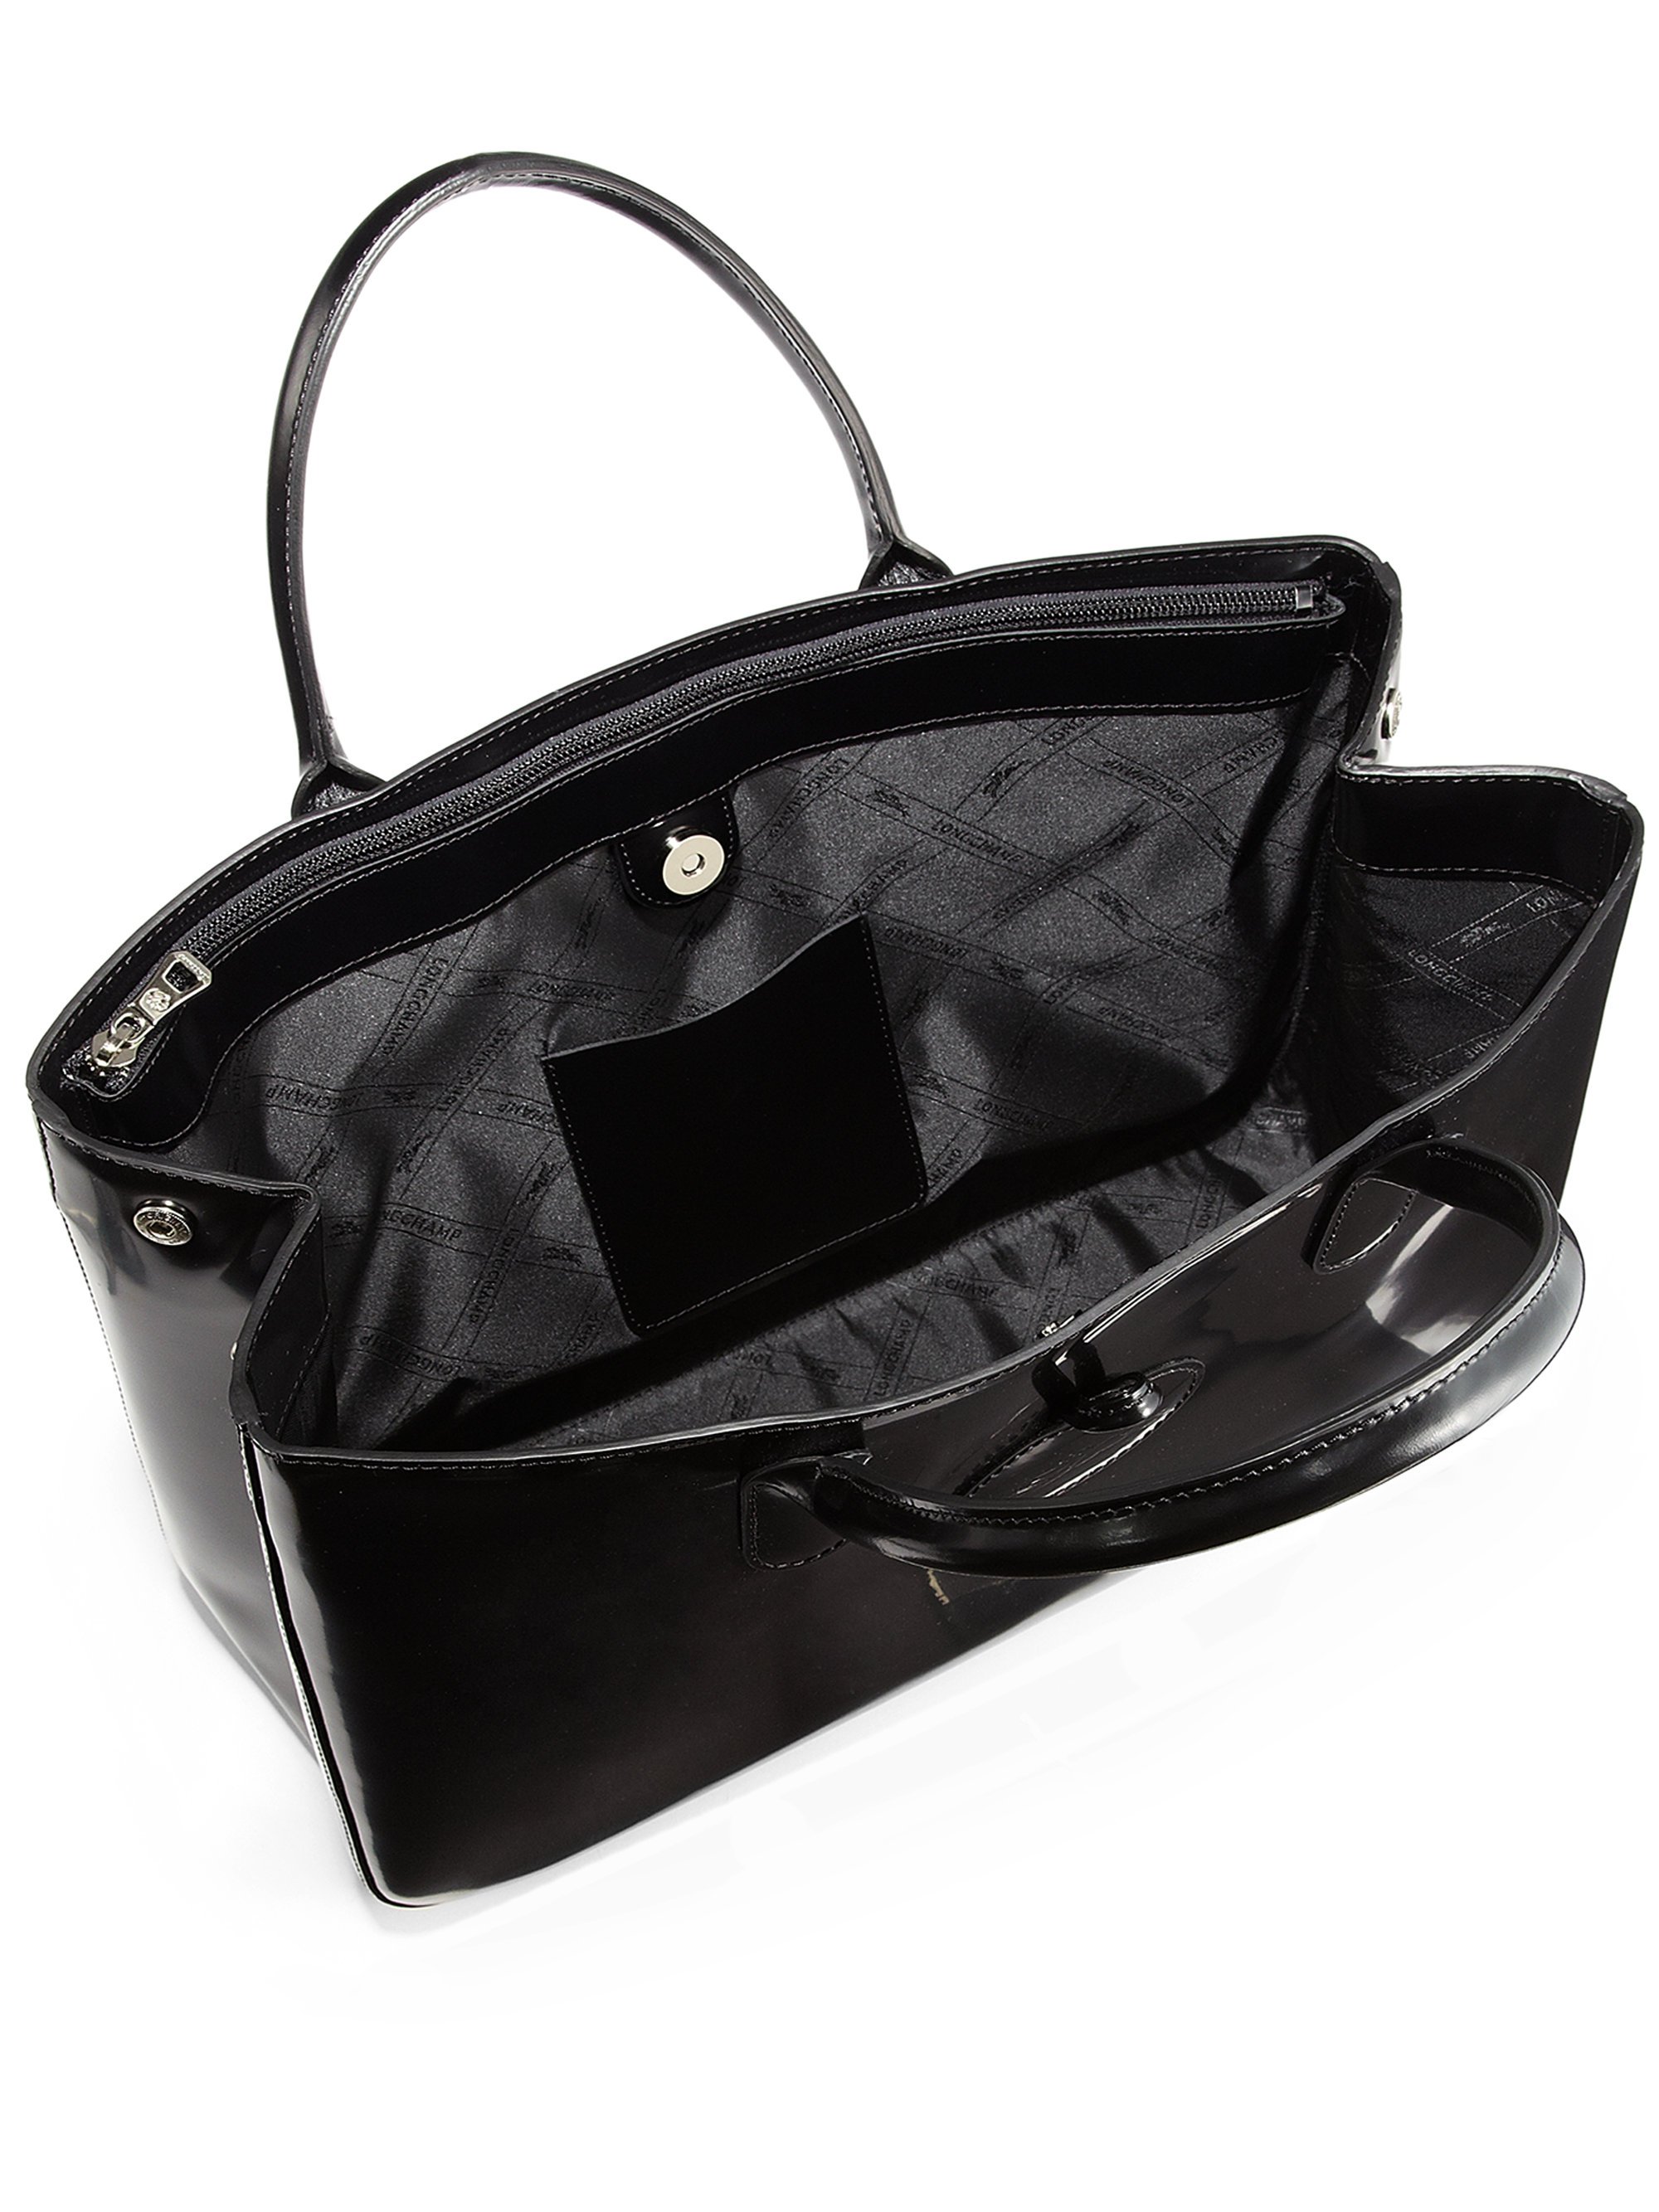 Lyst - Longchamp Roseau Large Patent Leather Box Tote in Black 5c3d0a59b6464